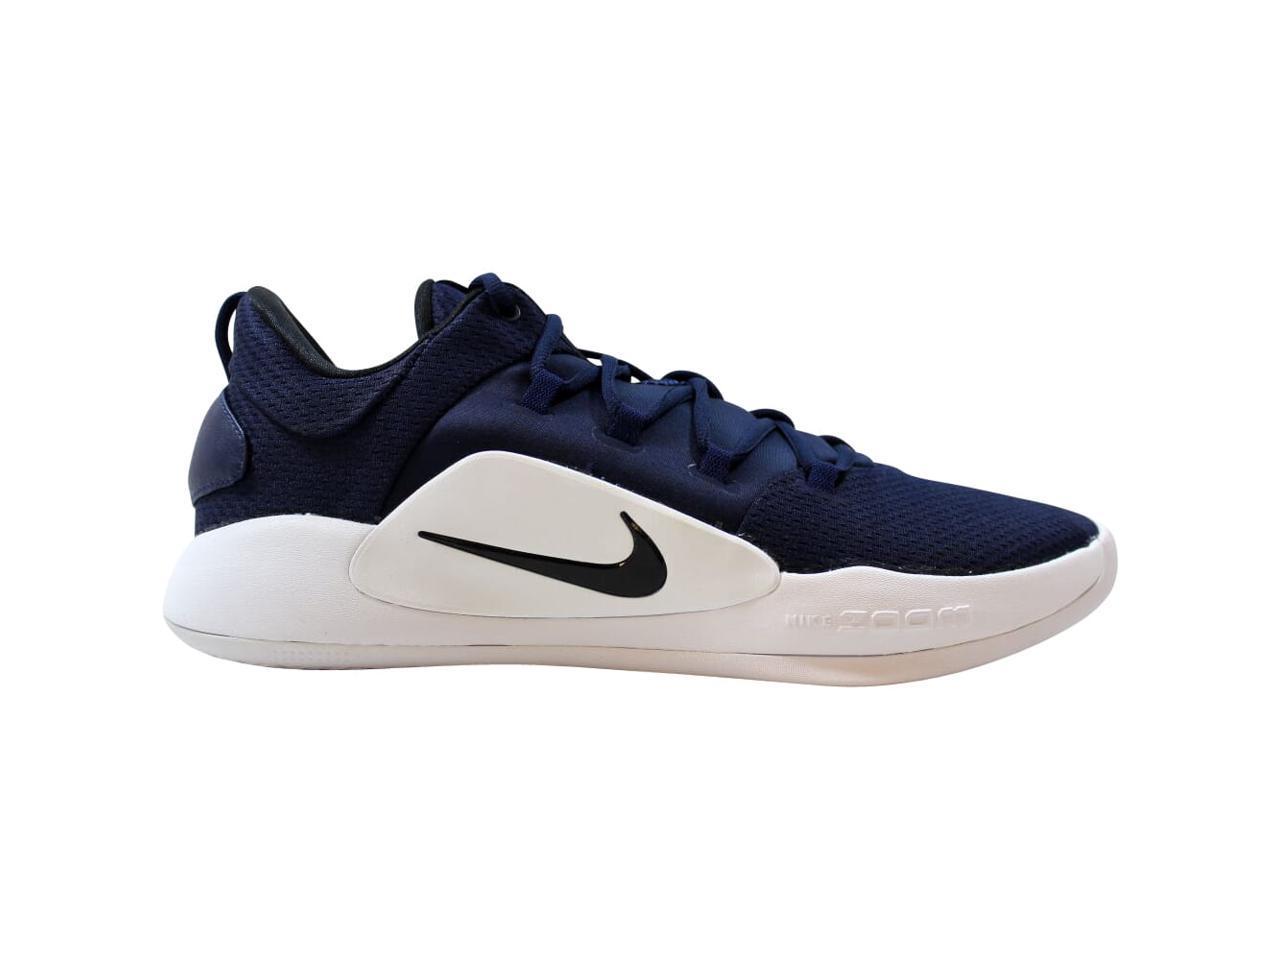 Nike Hyperdunk X Low Tb Midnight Navy